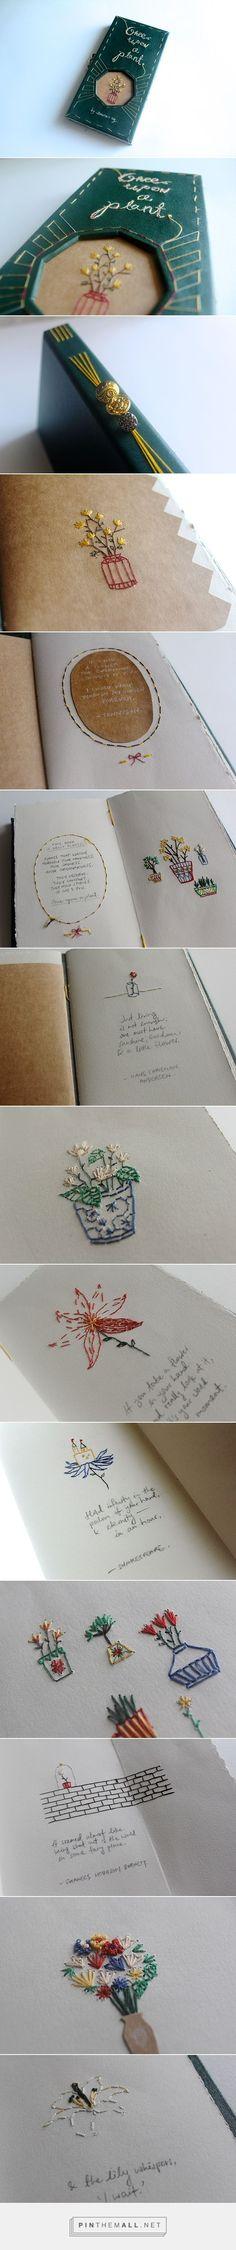 detalles de bordados en libro